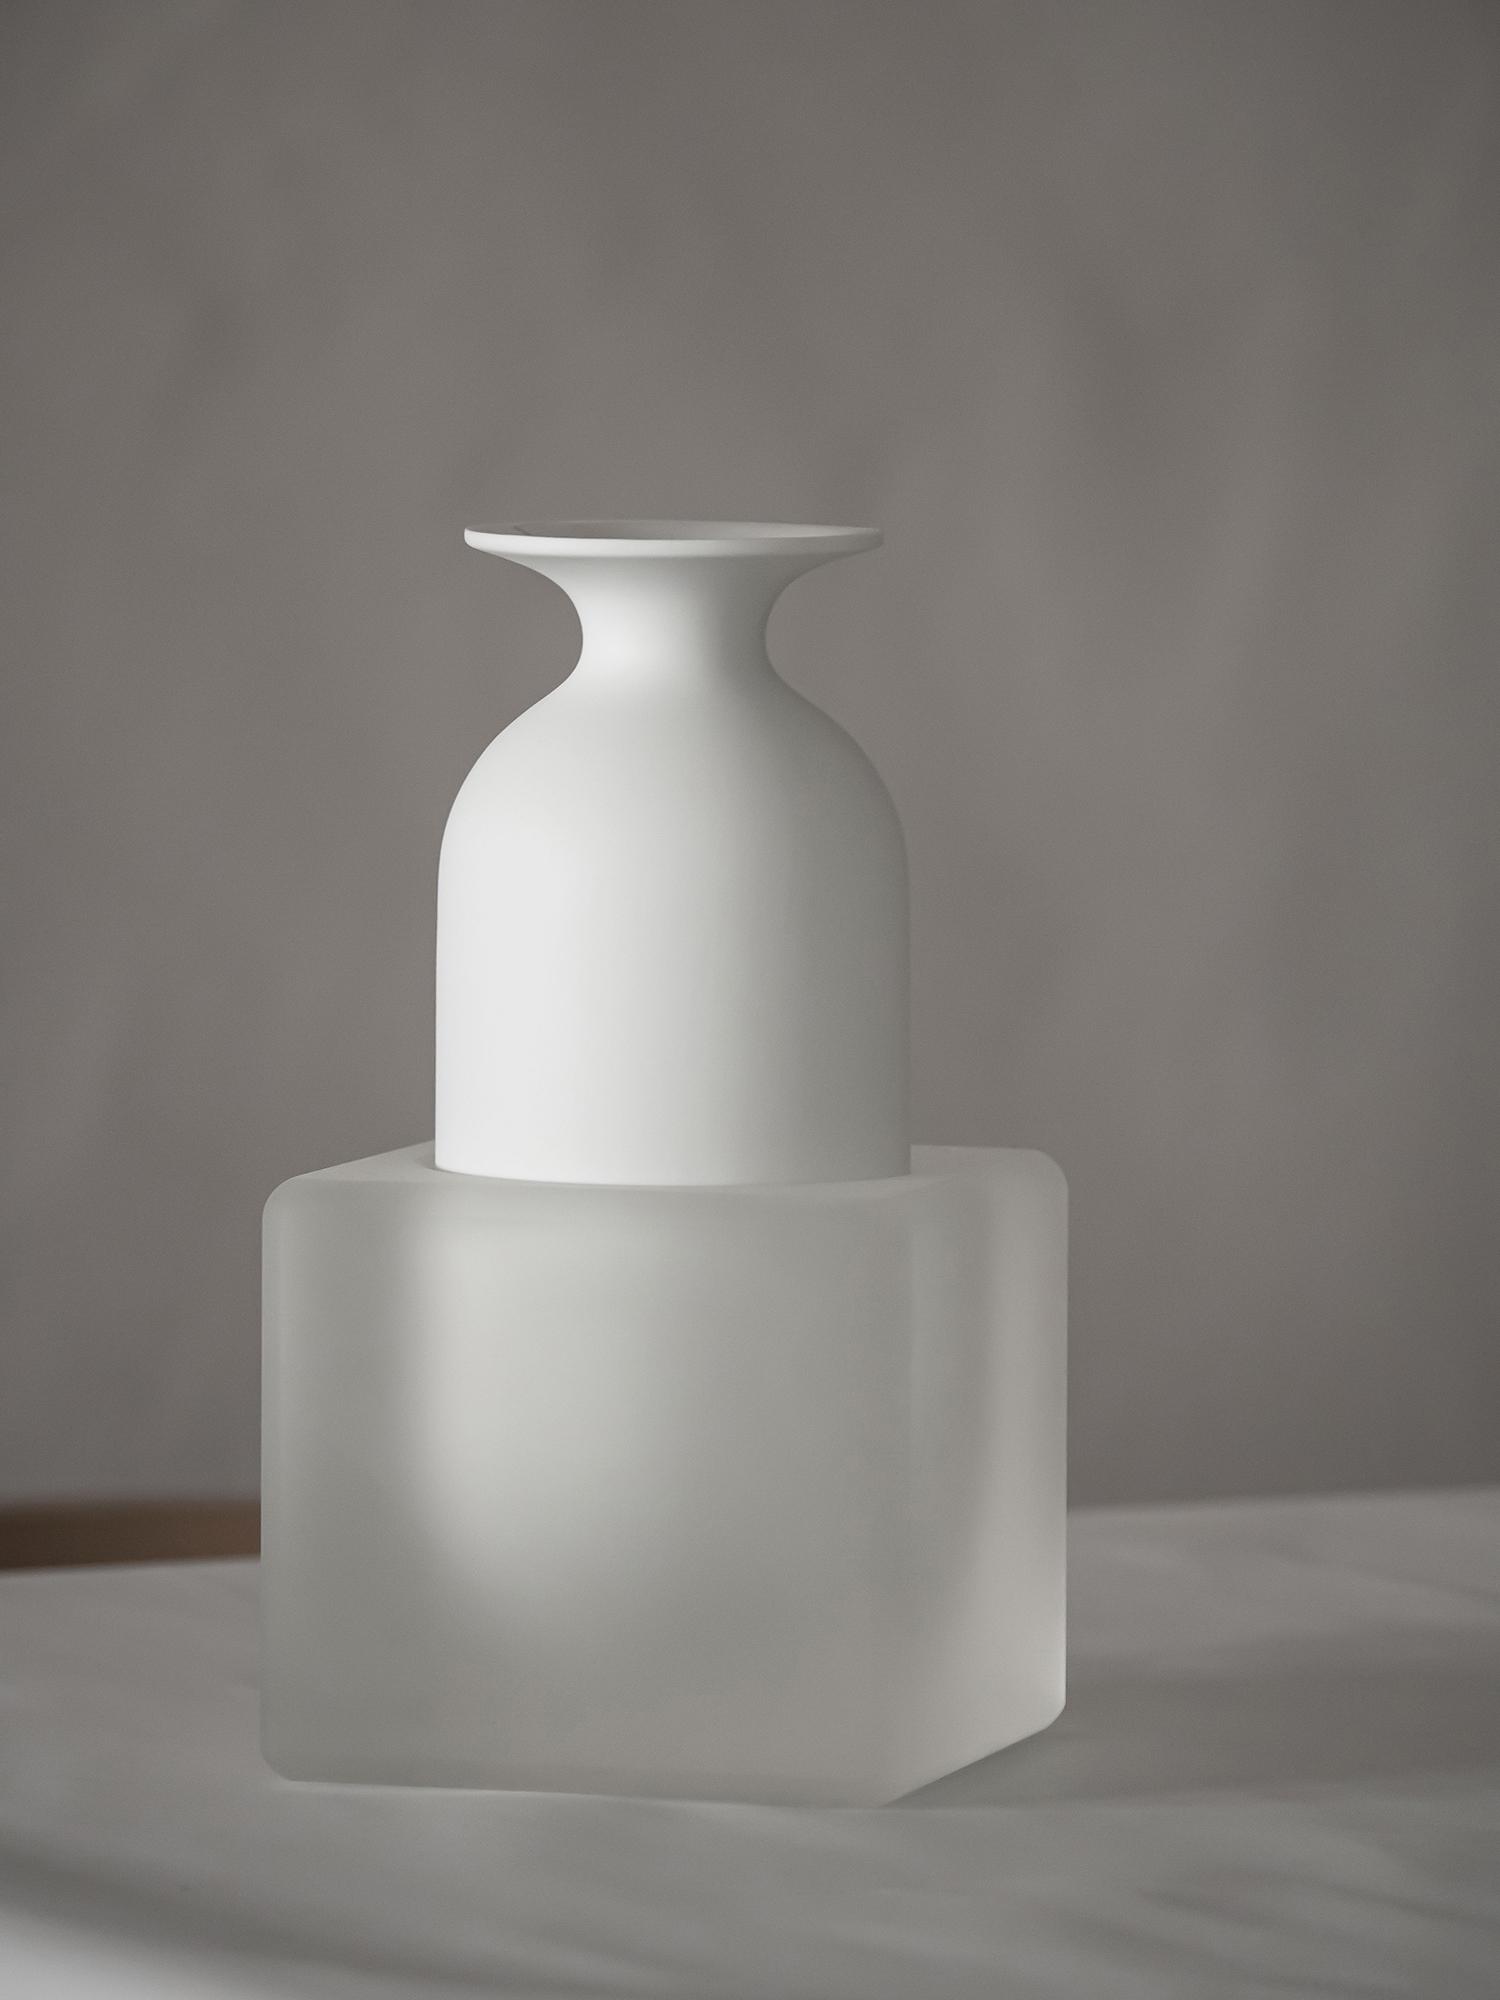 Freddo vase in white for Rosenthal, designed by Debiasi Sandri